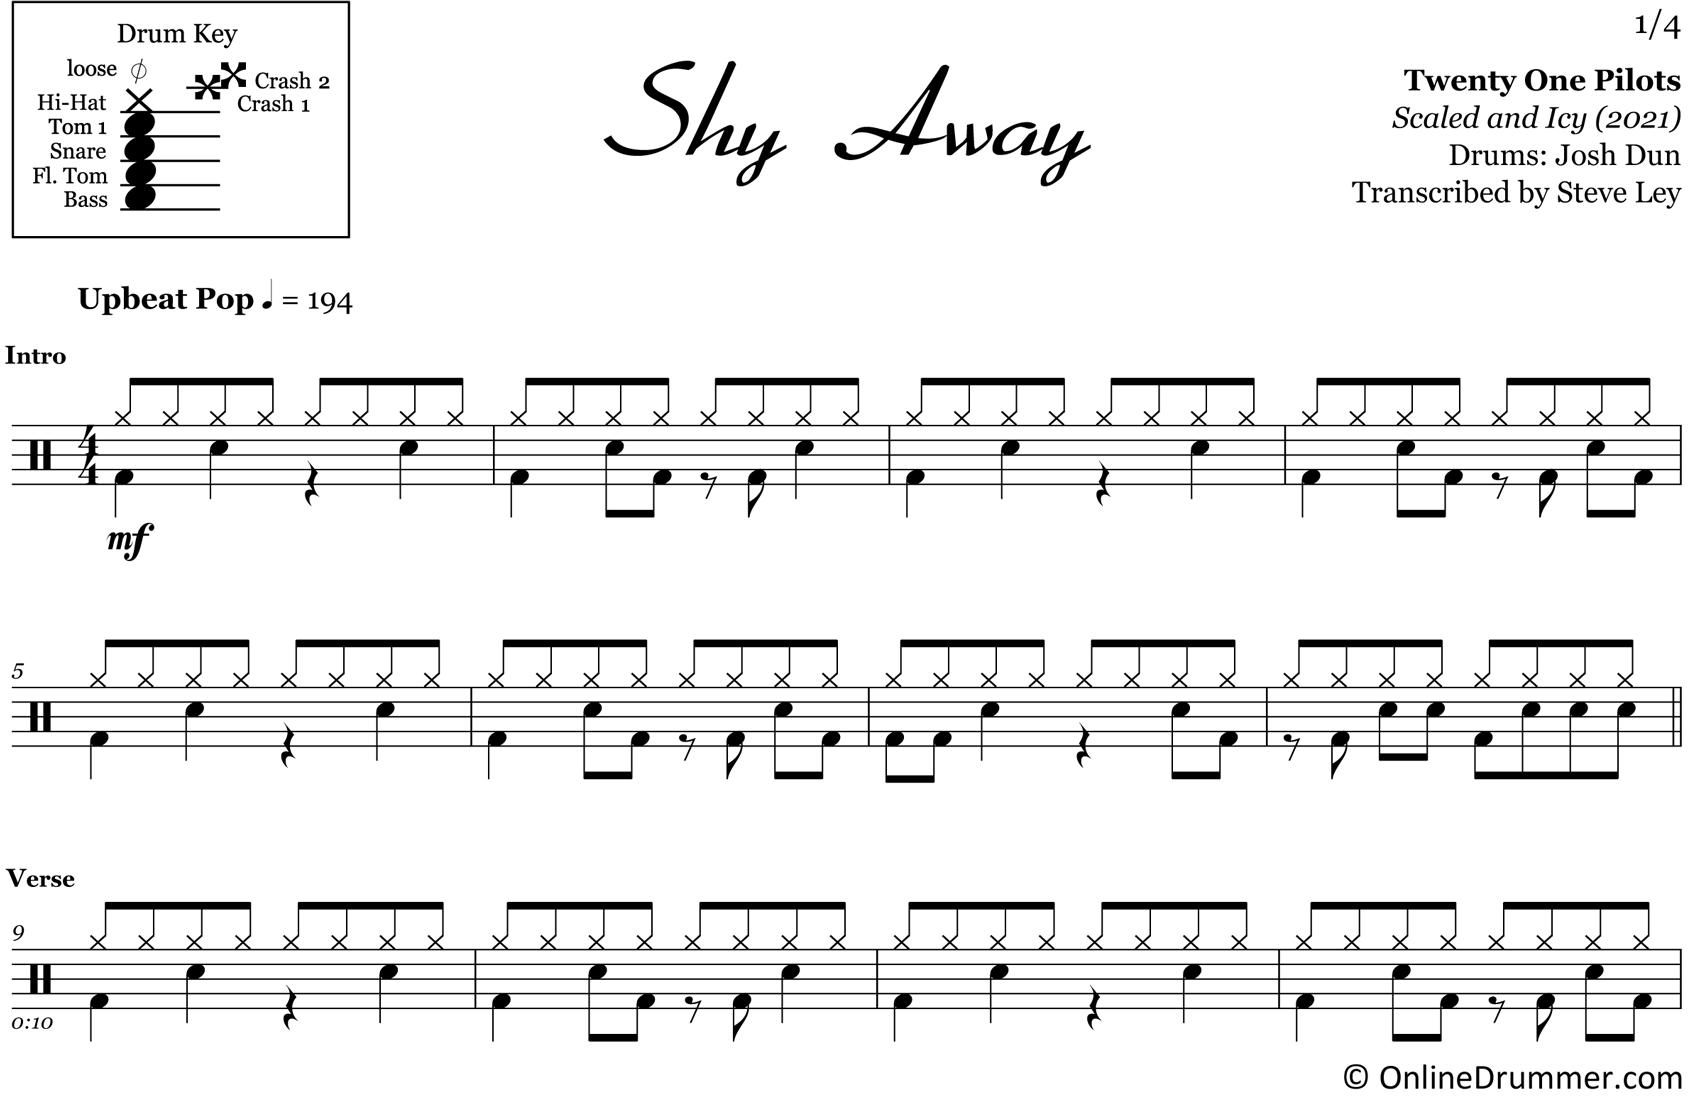 Shy Away - Twenty One Pilots - Drum Sheet Music